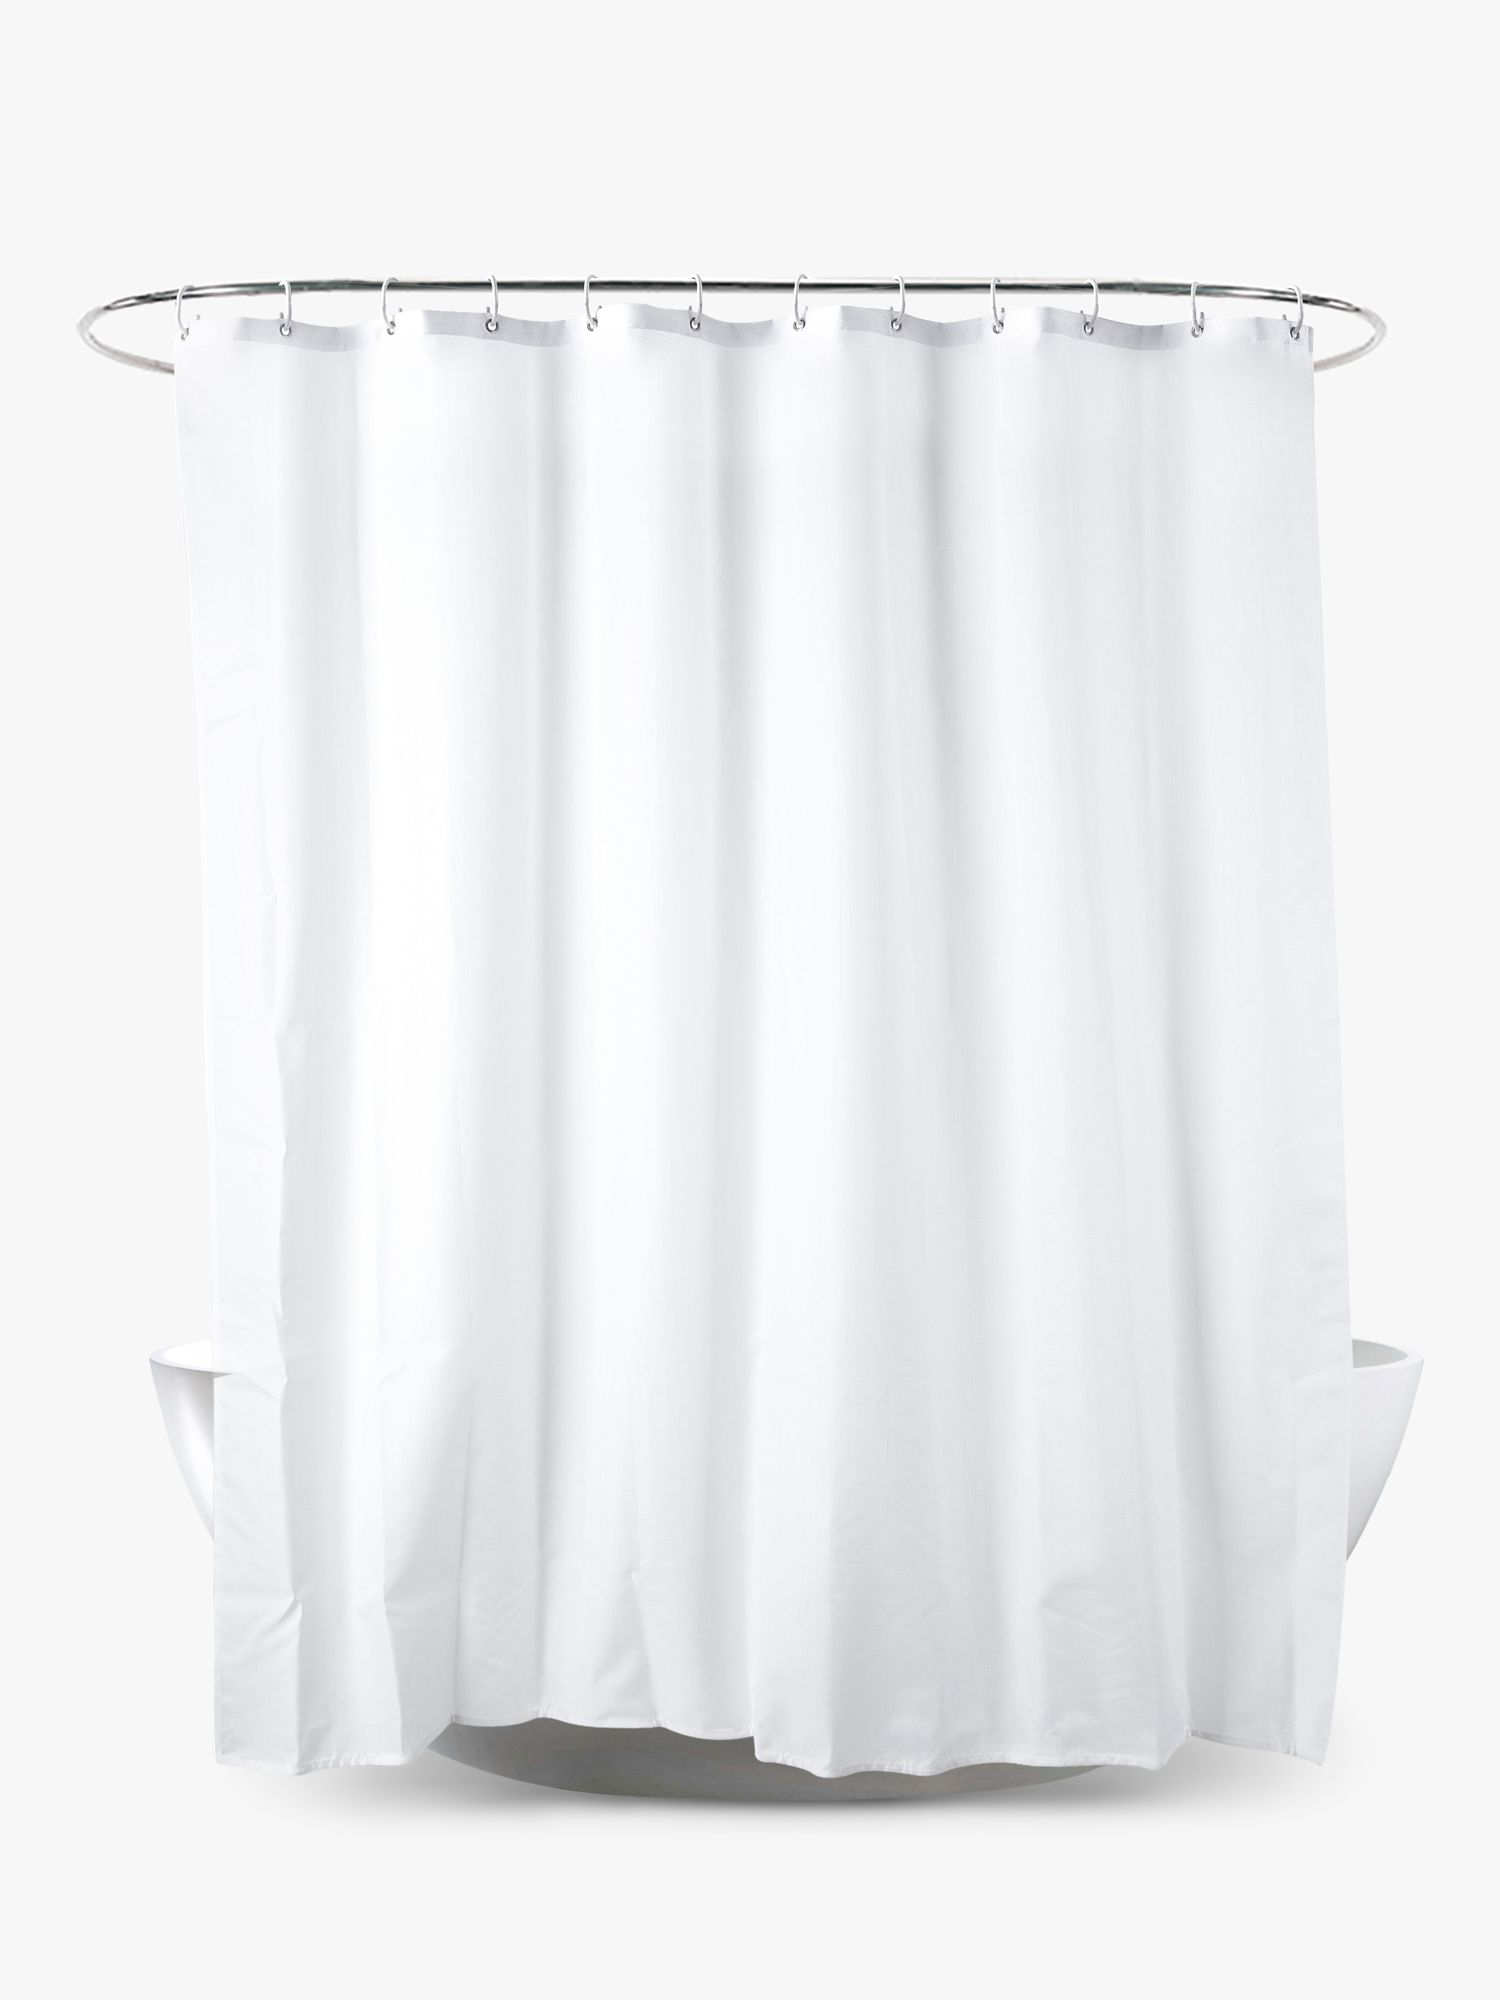 John Lewis & Partners Textured Slub Shower Curtain, Extra Long